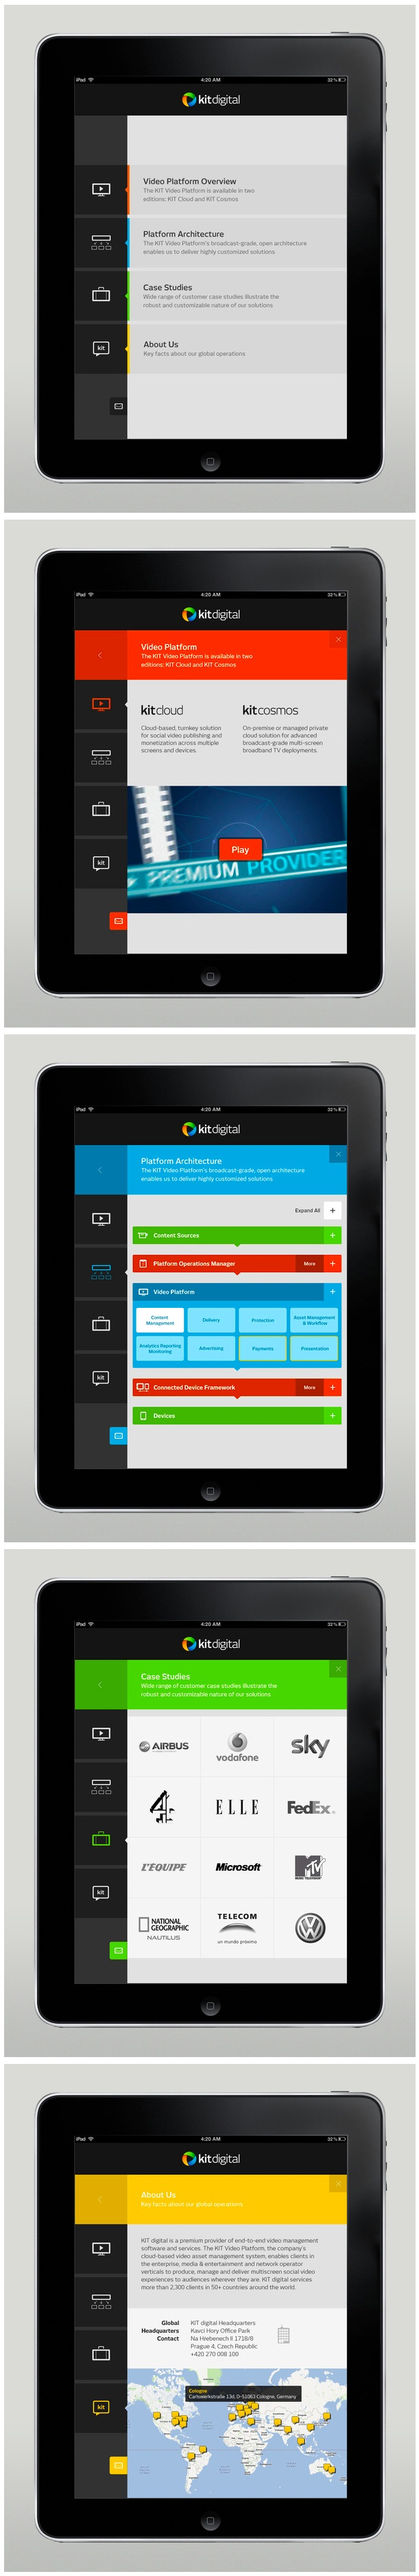 Modular iPad interface